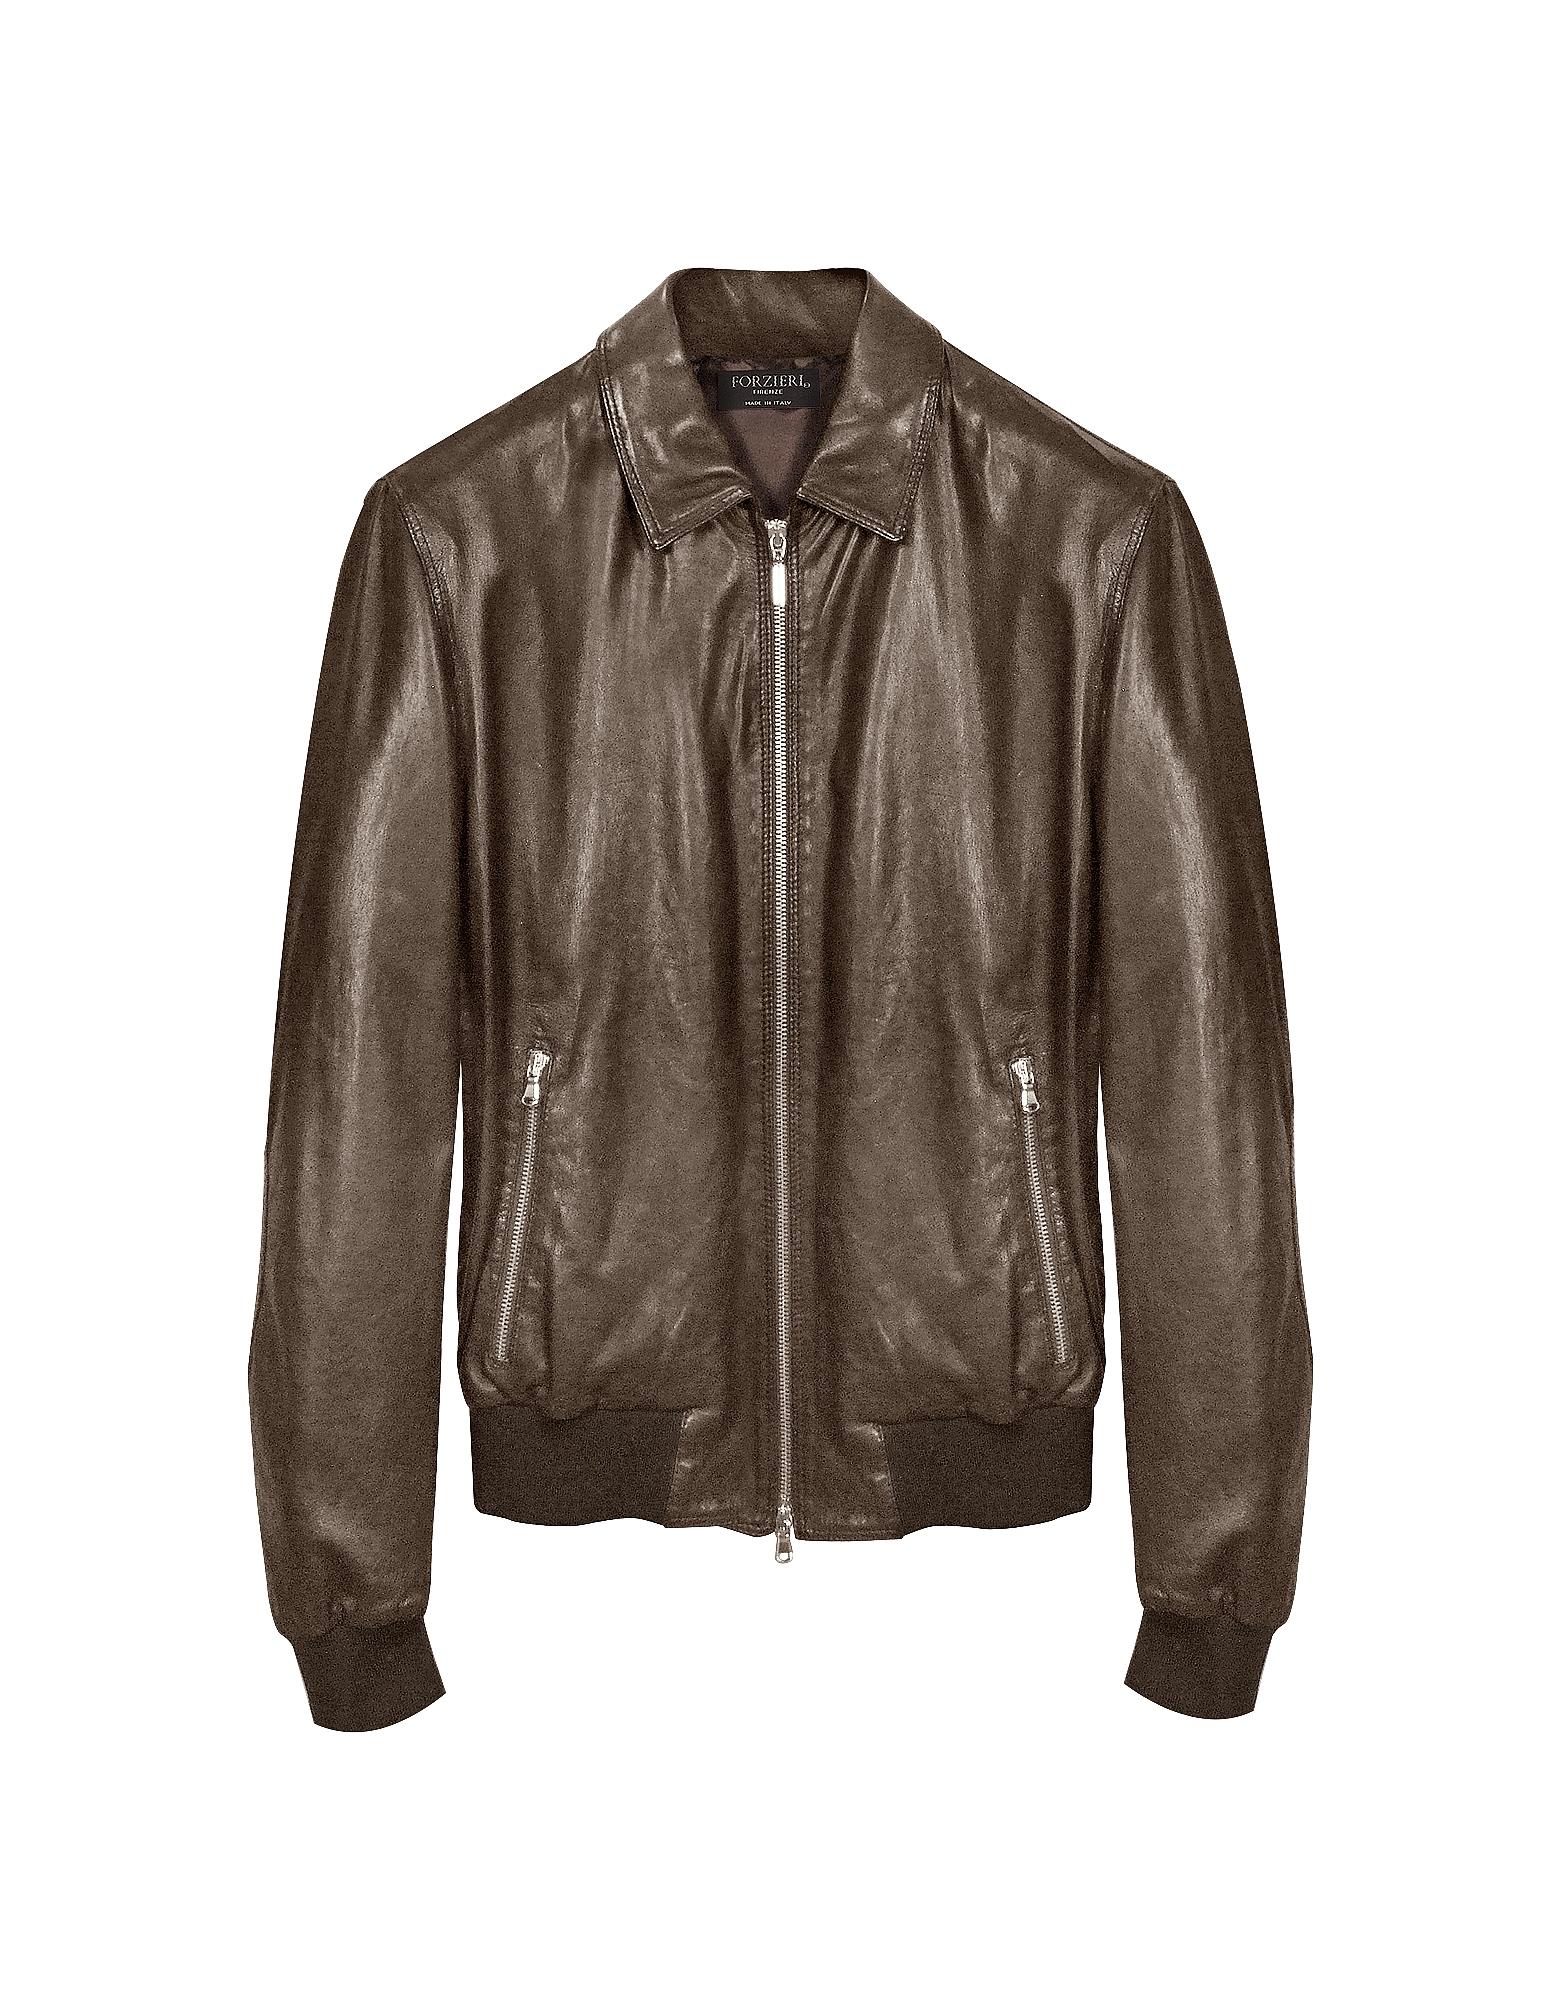 Темно-коричневая Кожаная Куртка Бомбер